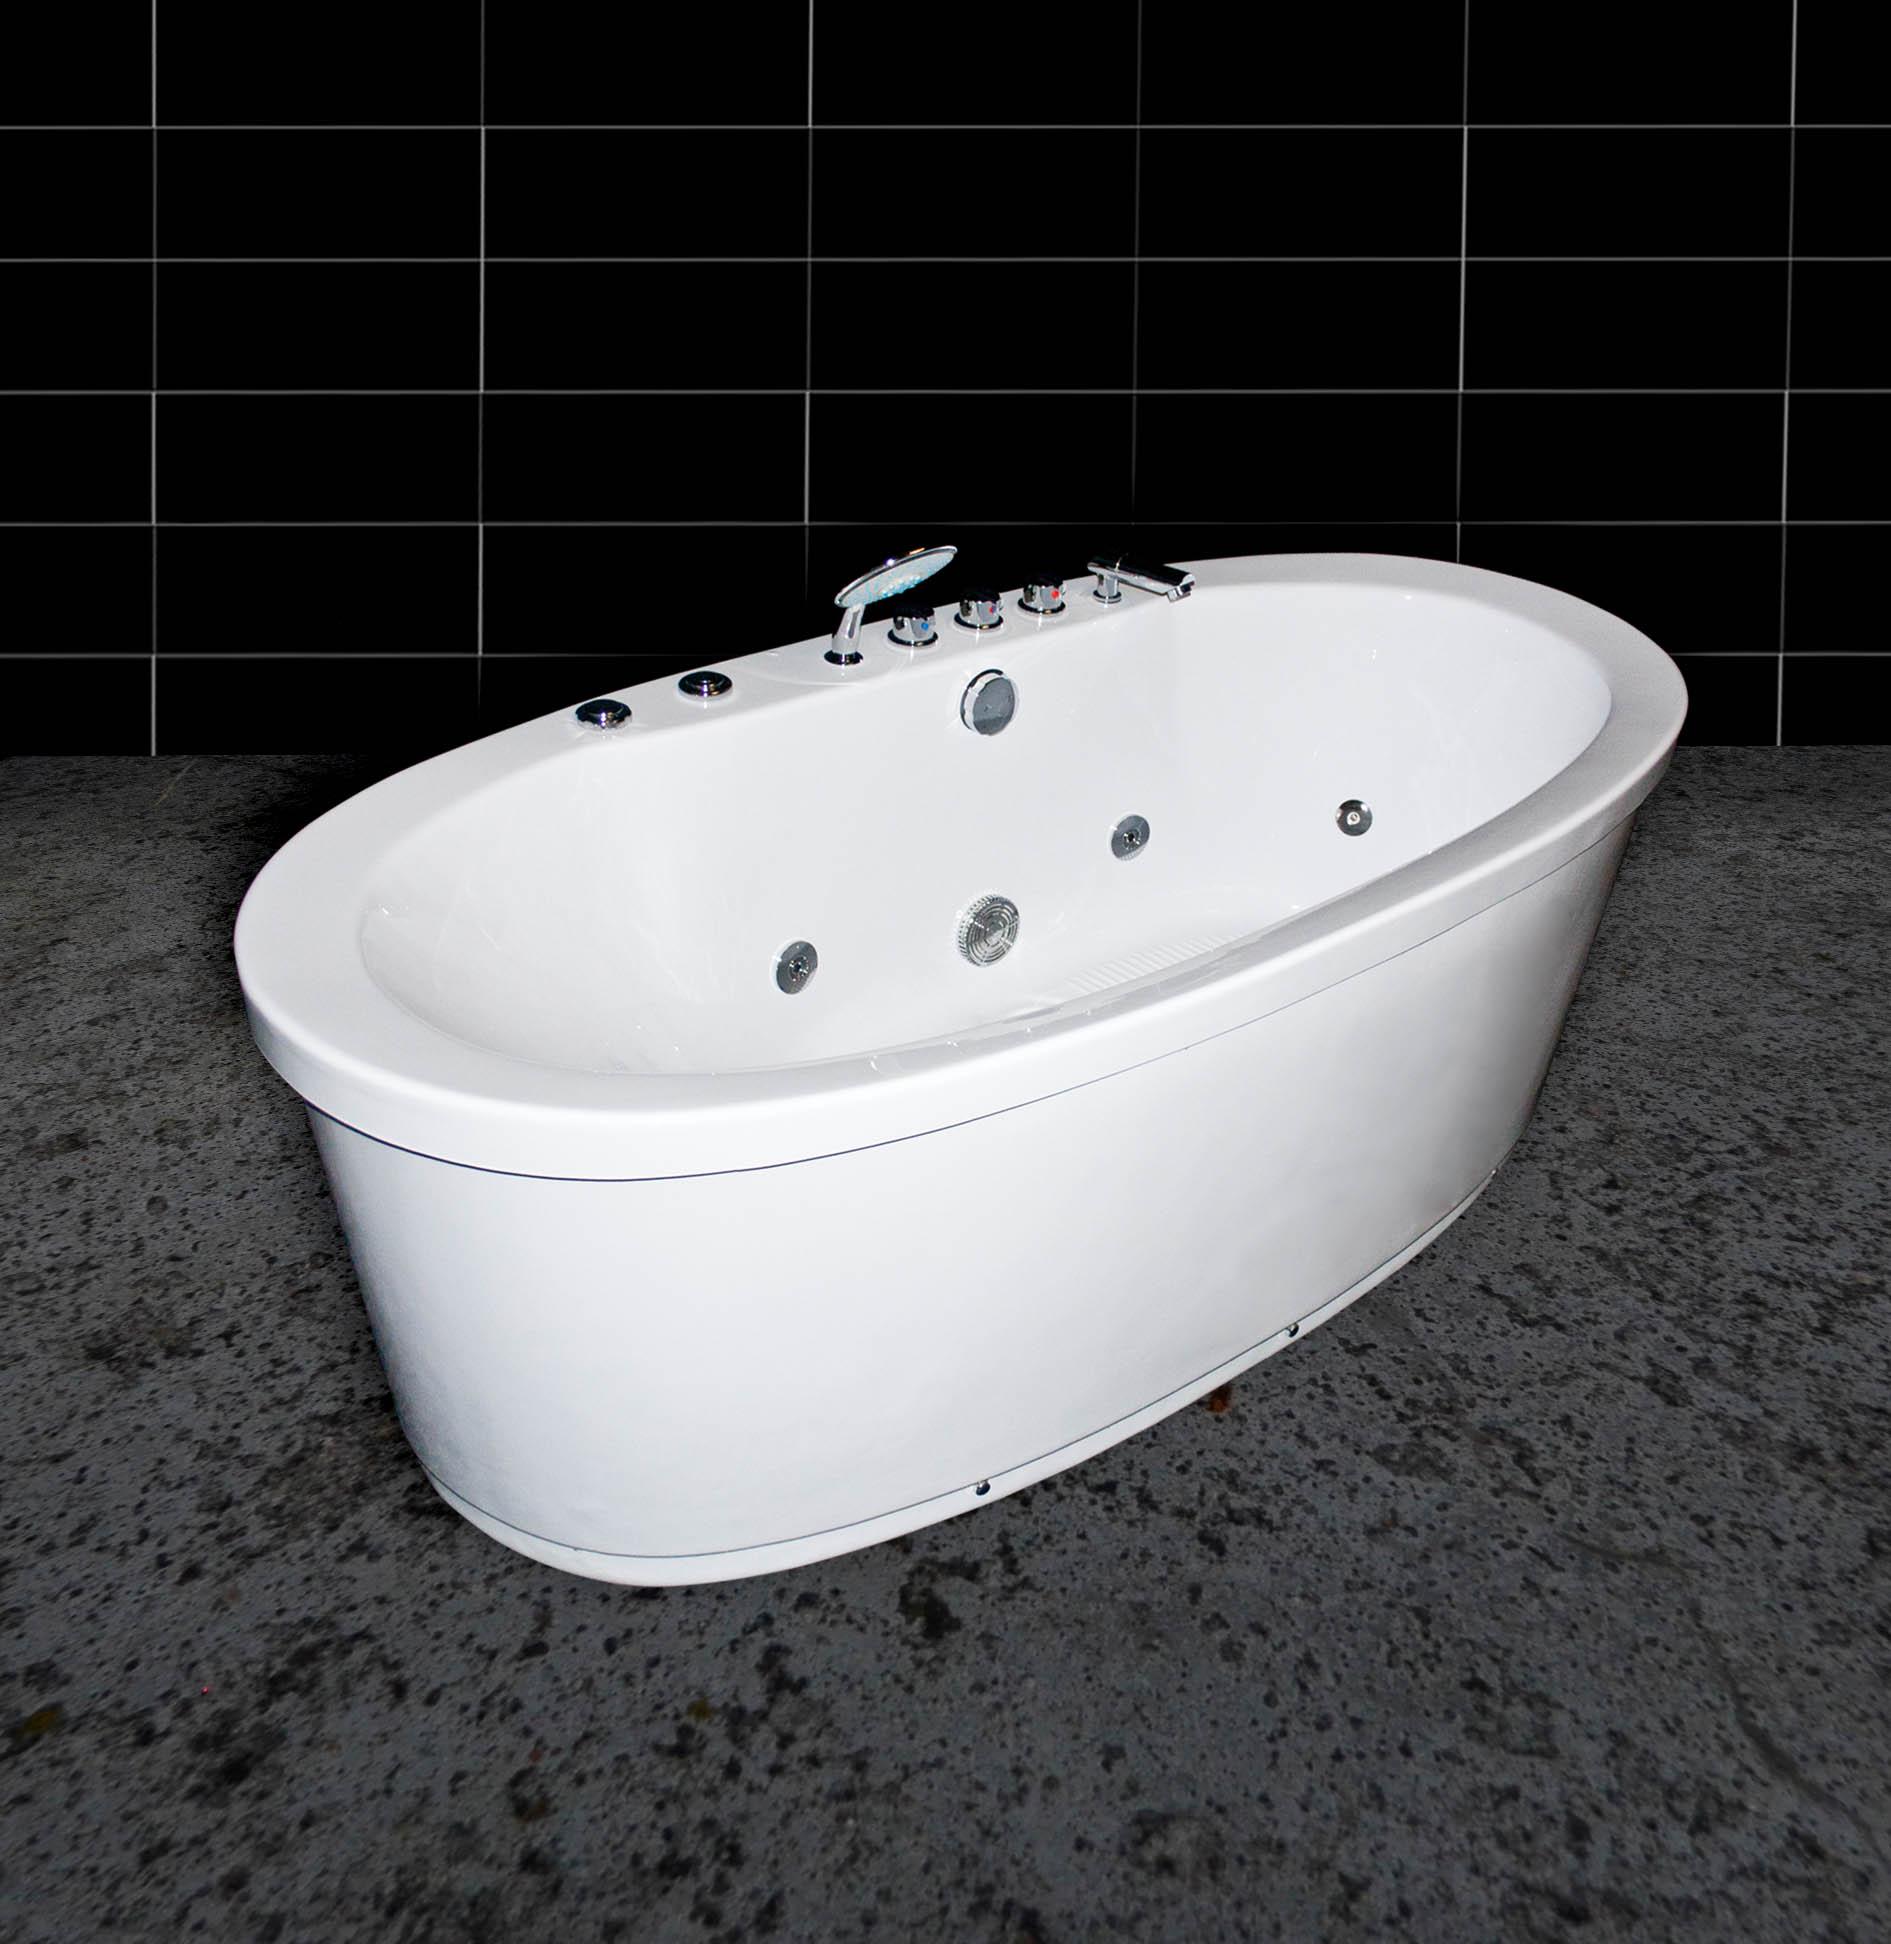 Whirlpool Einlage Fr Badewanne : Armatur Fr Freistehende Badewanne Grohe: Freistehende badewanne paris ...